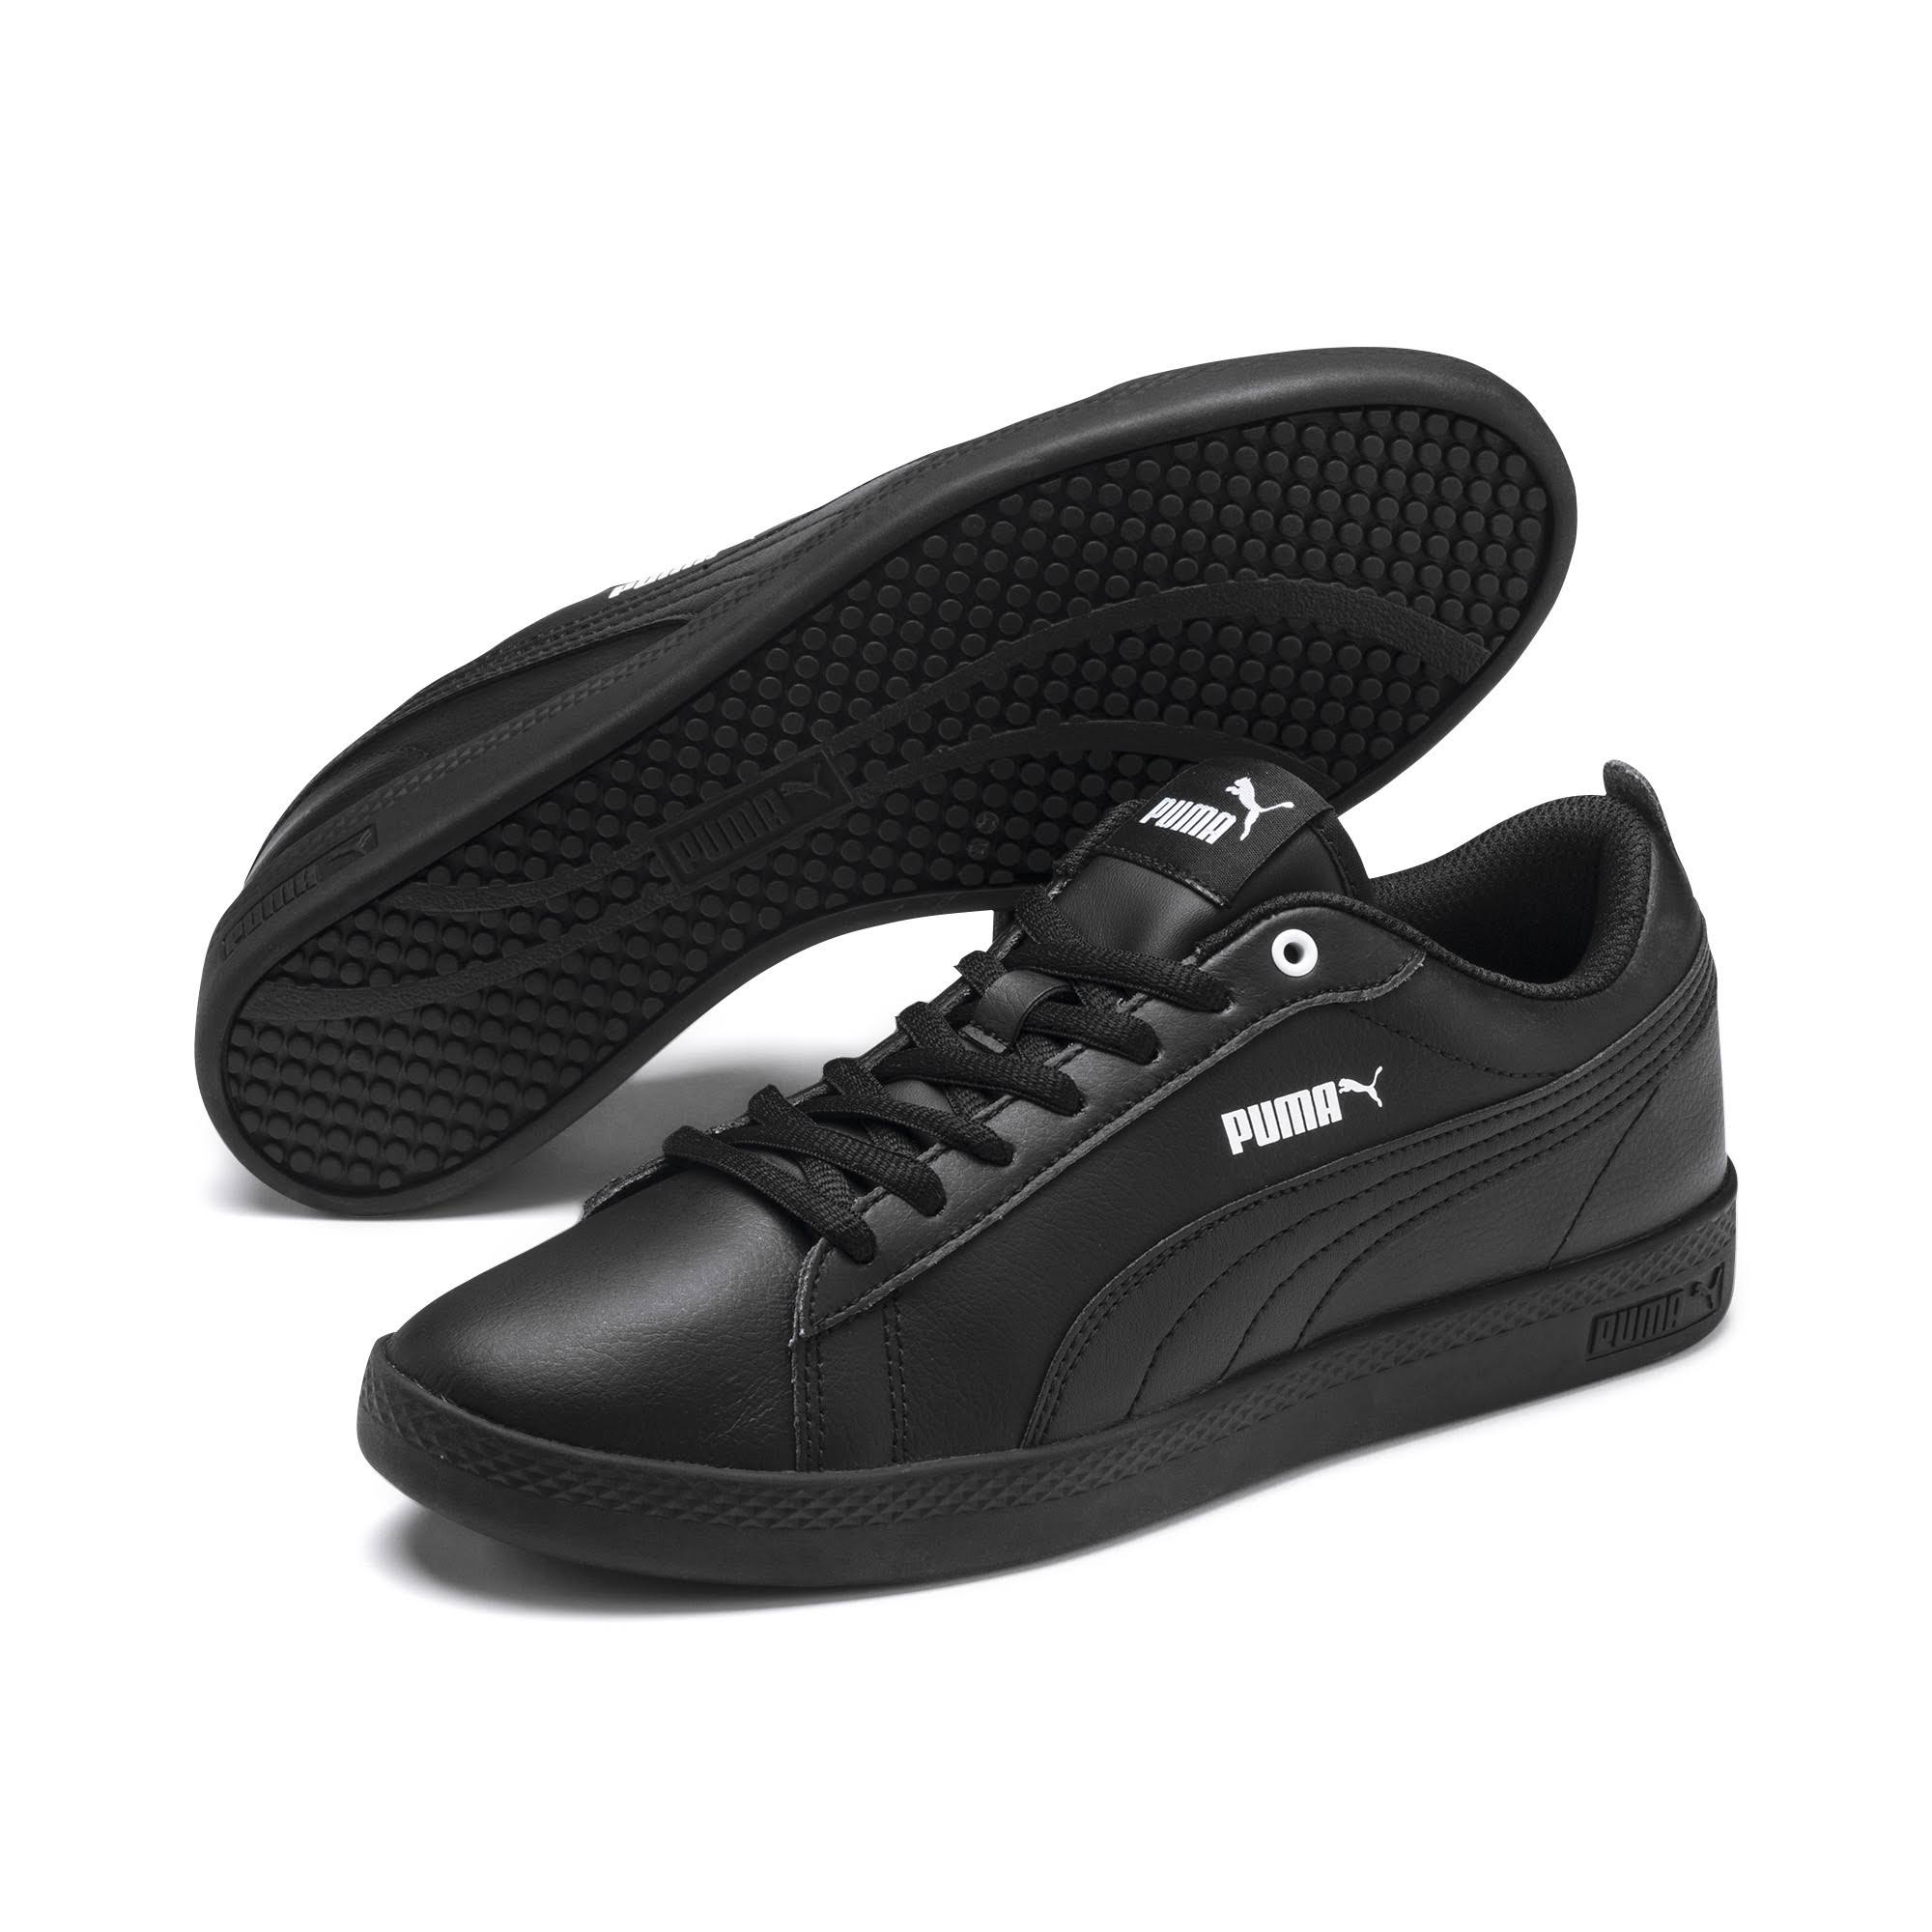 5 B Zapatillas Smash Negro V2 5 Puma Mujer L Negro Hp6wq0Fxp